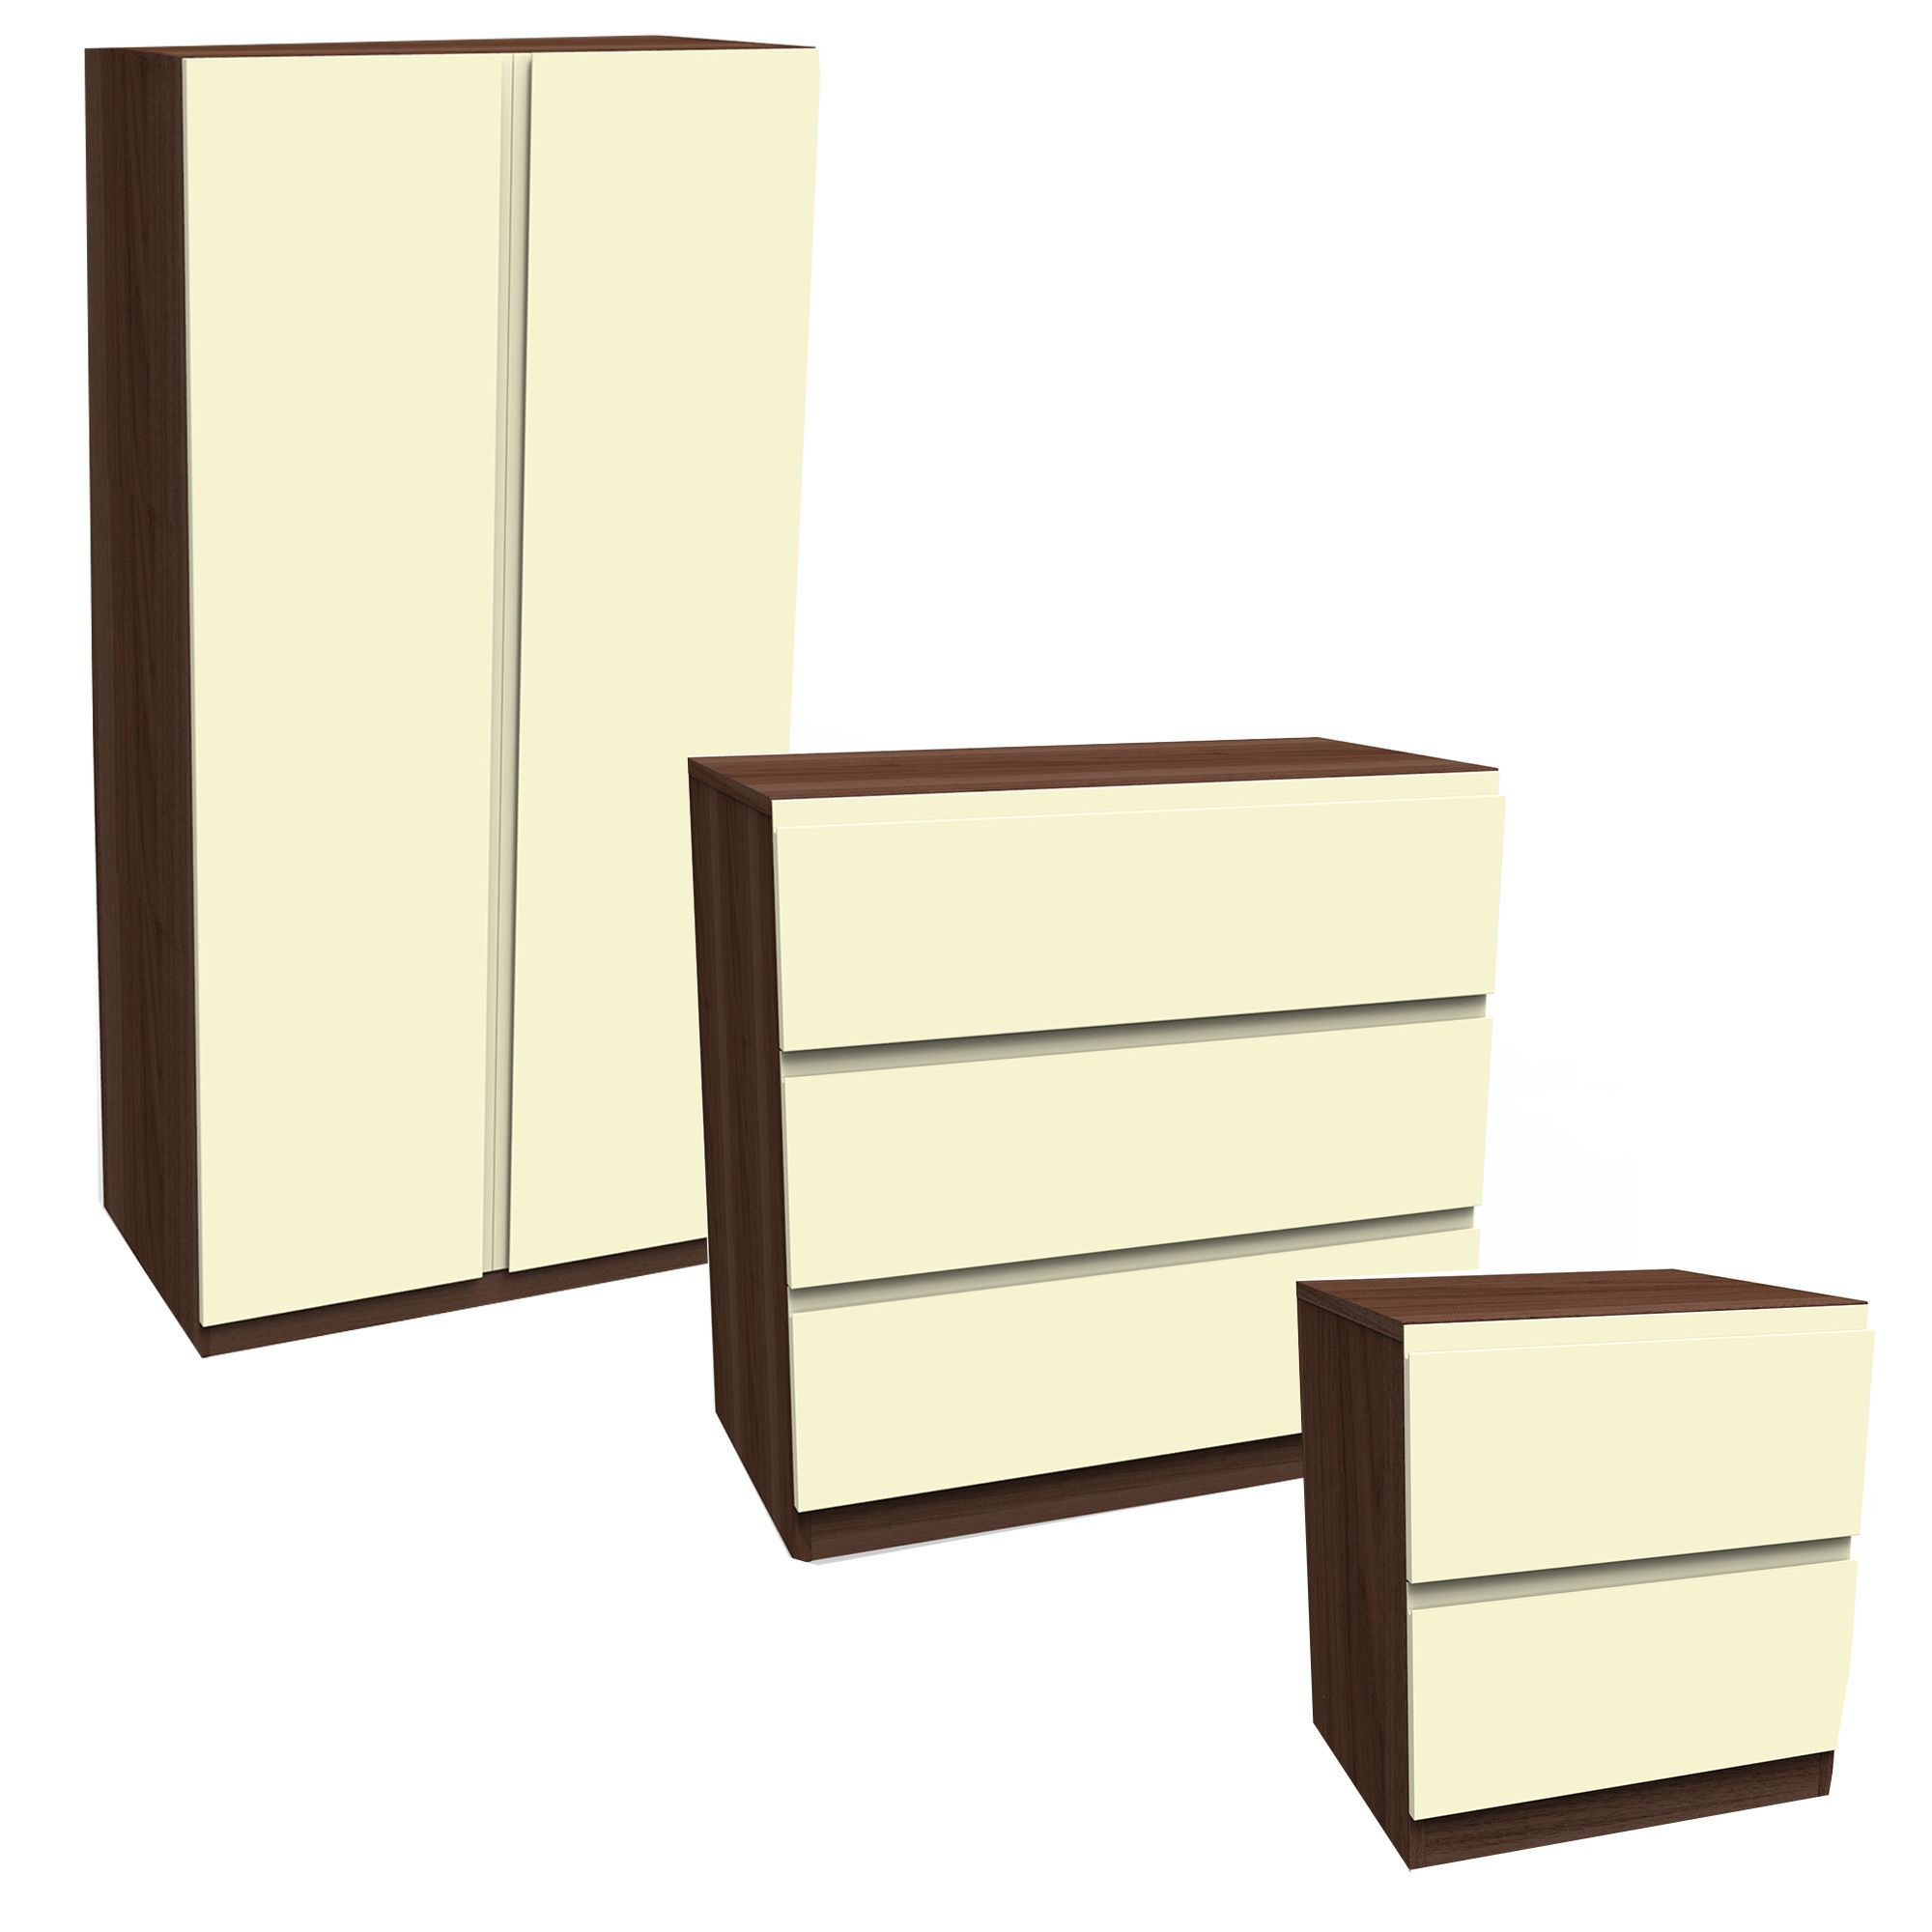 darwin gloss cream walnut effect 3 piece bedroom furniture set departments diy at b q. Black Bedroom Furniture Sets. Home Design Ideas